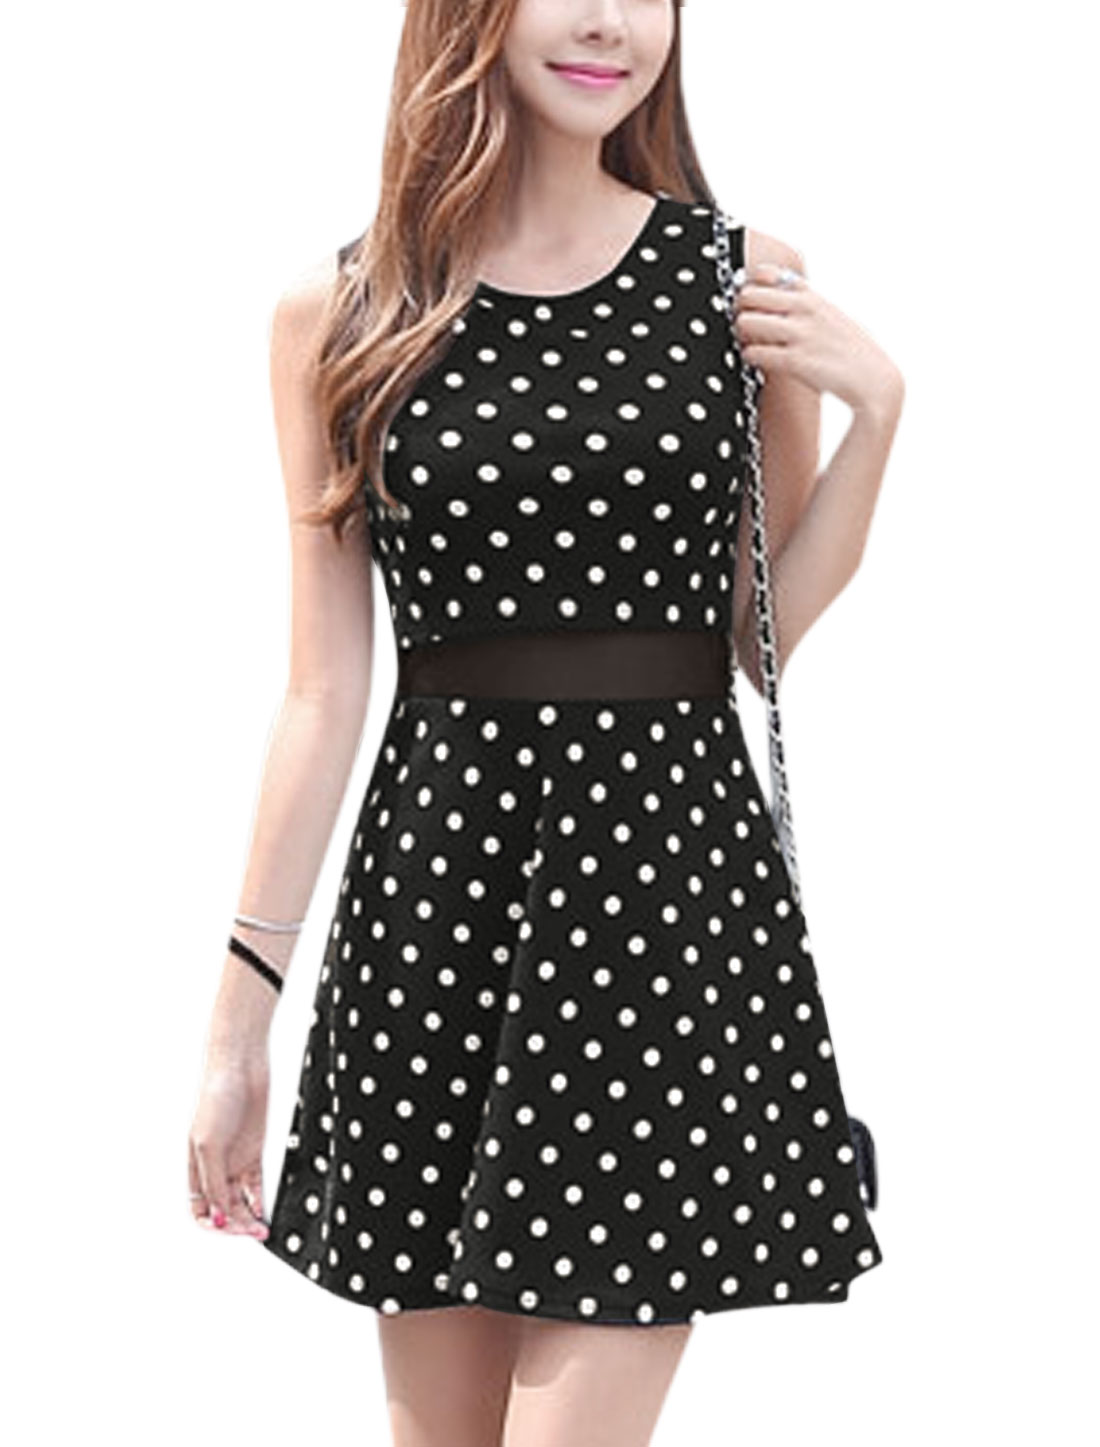 Woman Polka Dots Prints Round Neck Sleeveless Textured A Line Dress Black M